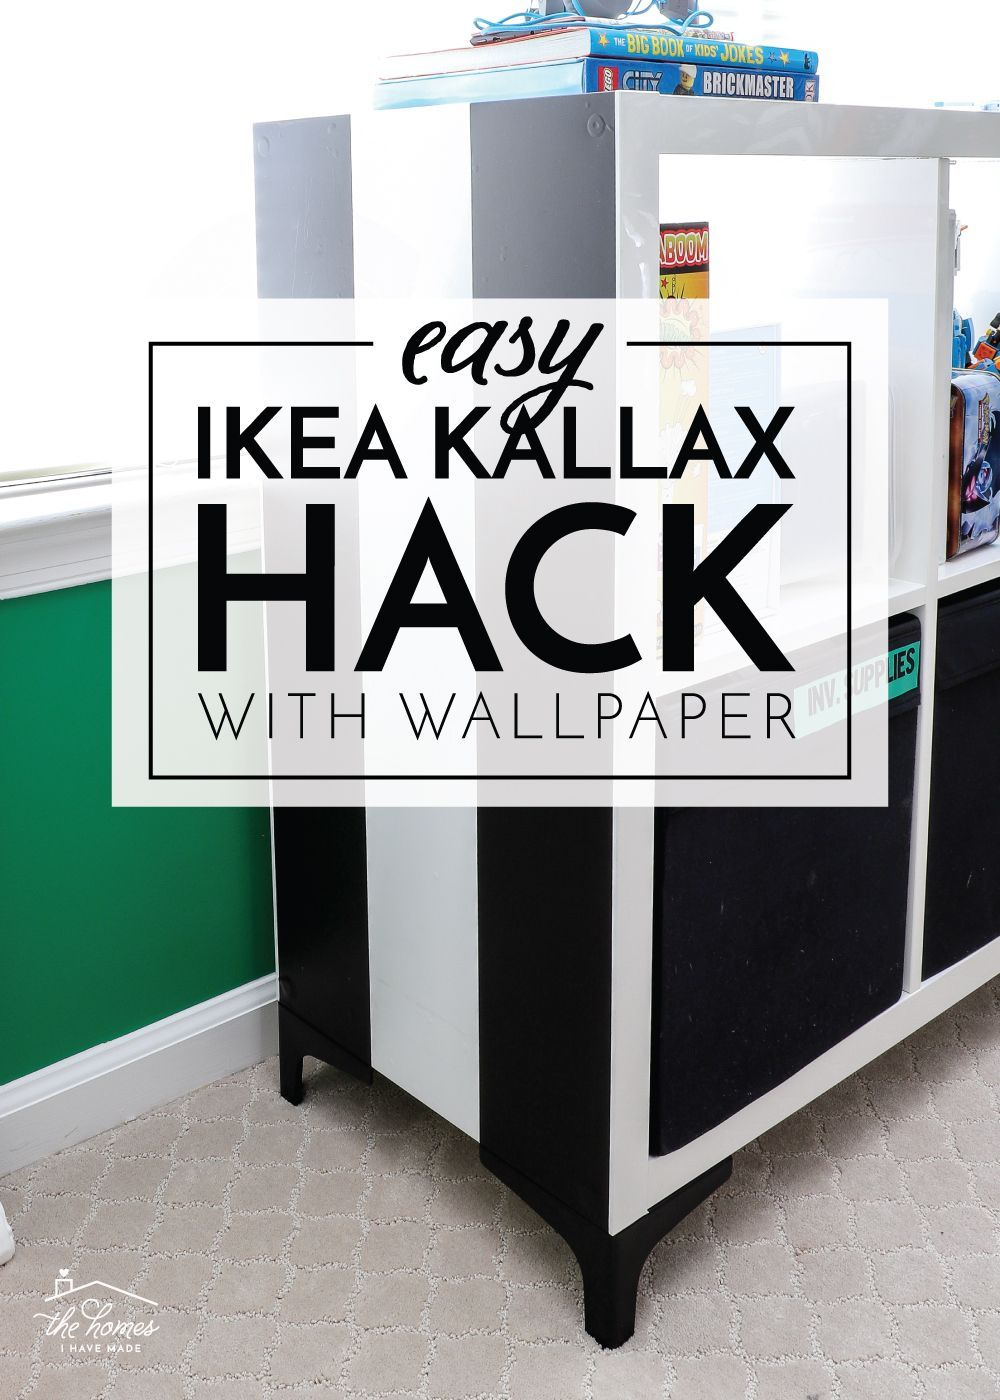 Ikea Kallax Hack With Wallpaper Kallax Ikea Ikea Kallax Hack Ikea